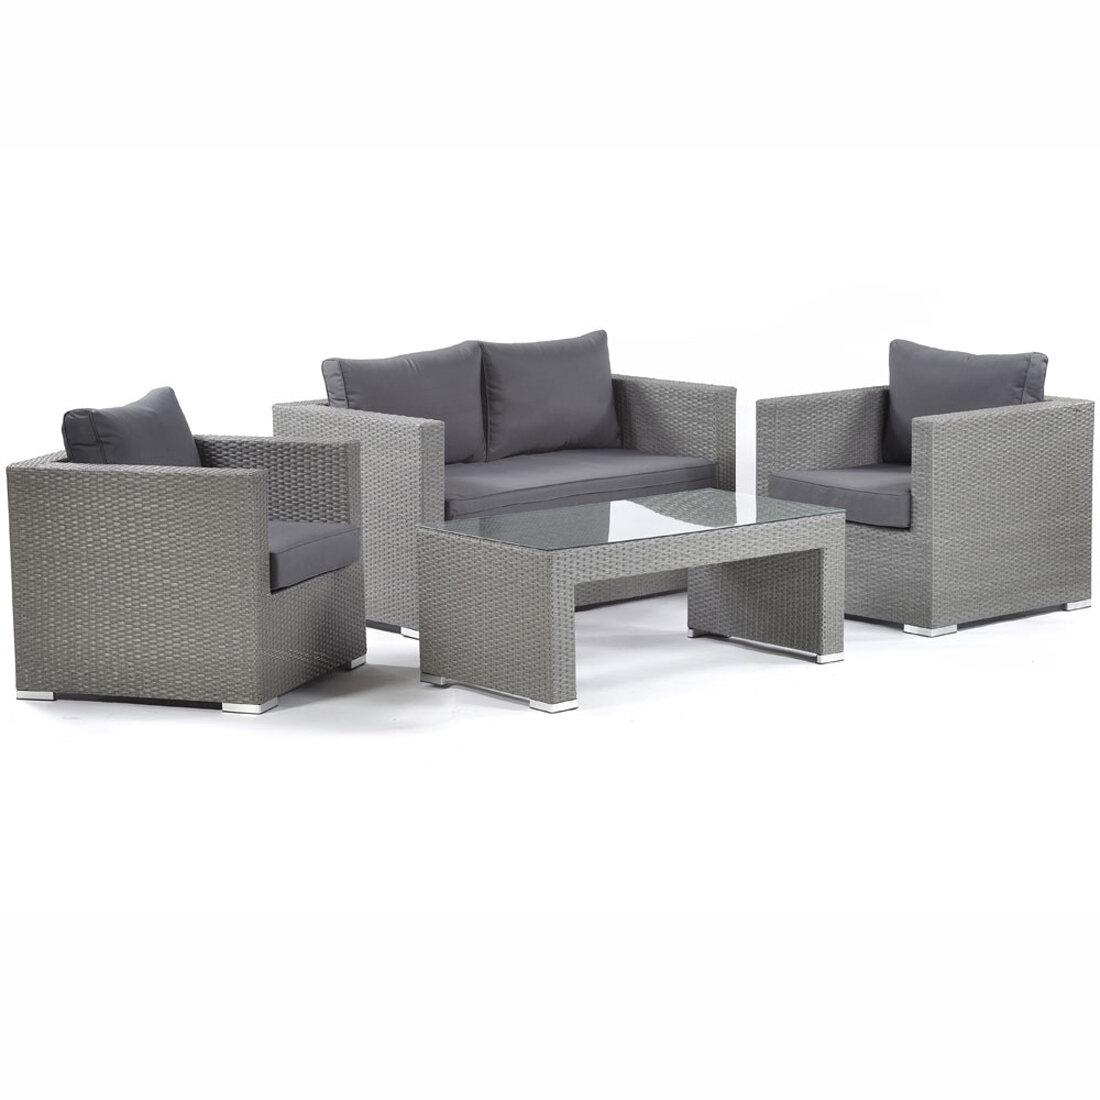 Picture of: Sol 72 Outdoor Ashong 4 Seater Rattan Sofa Set Wayfair Co Uk